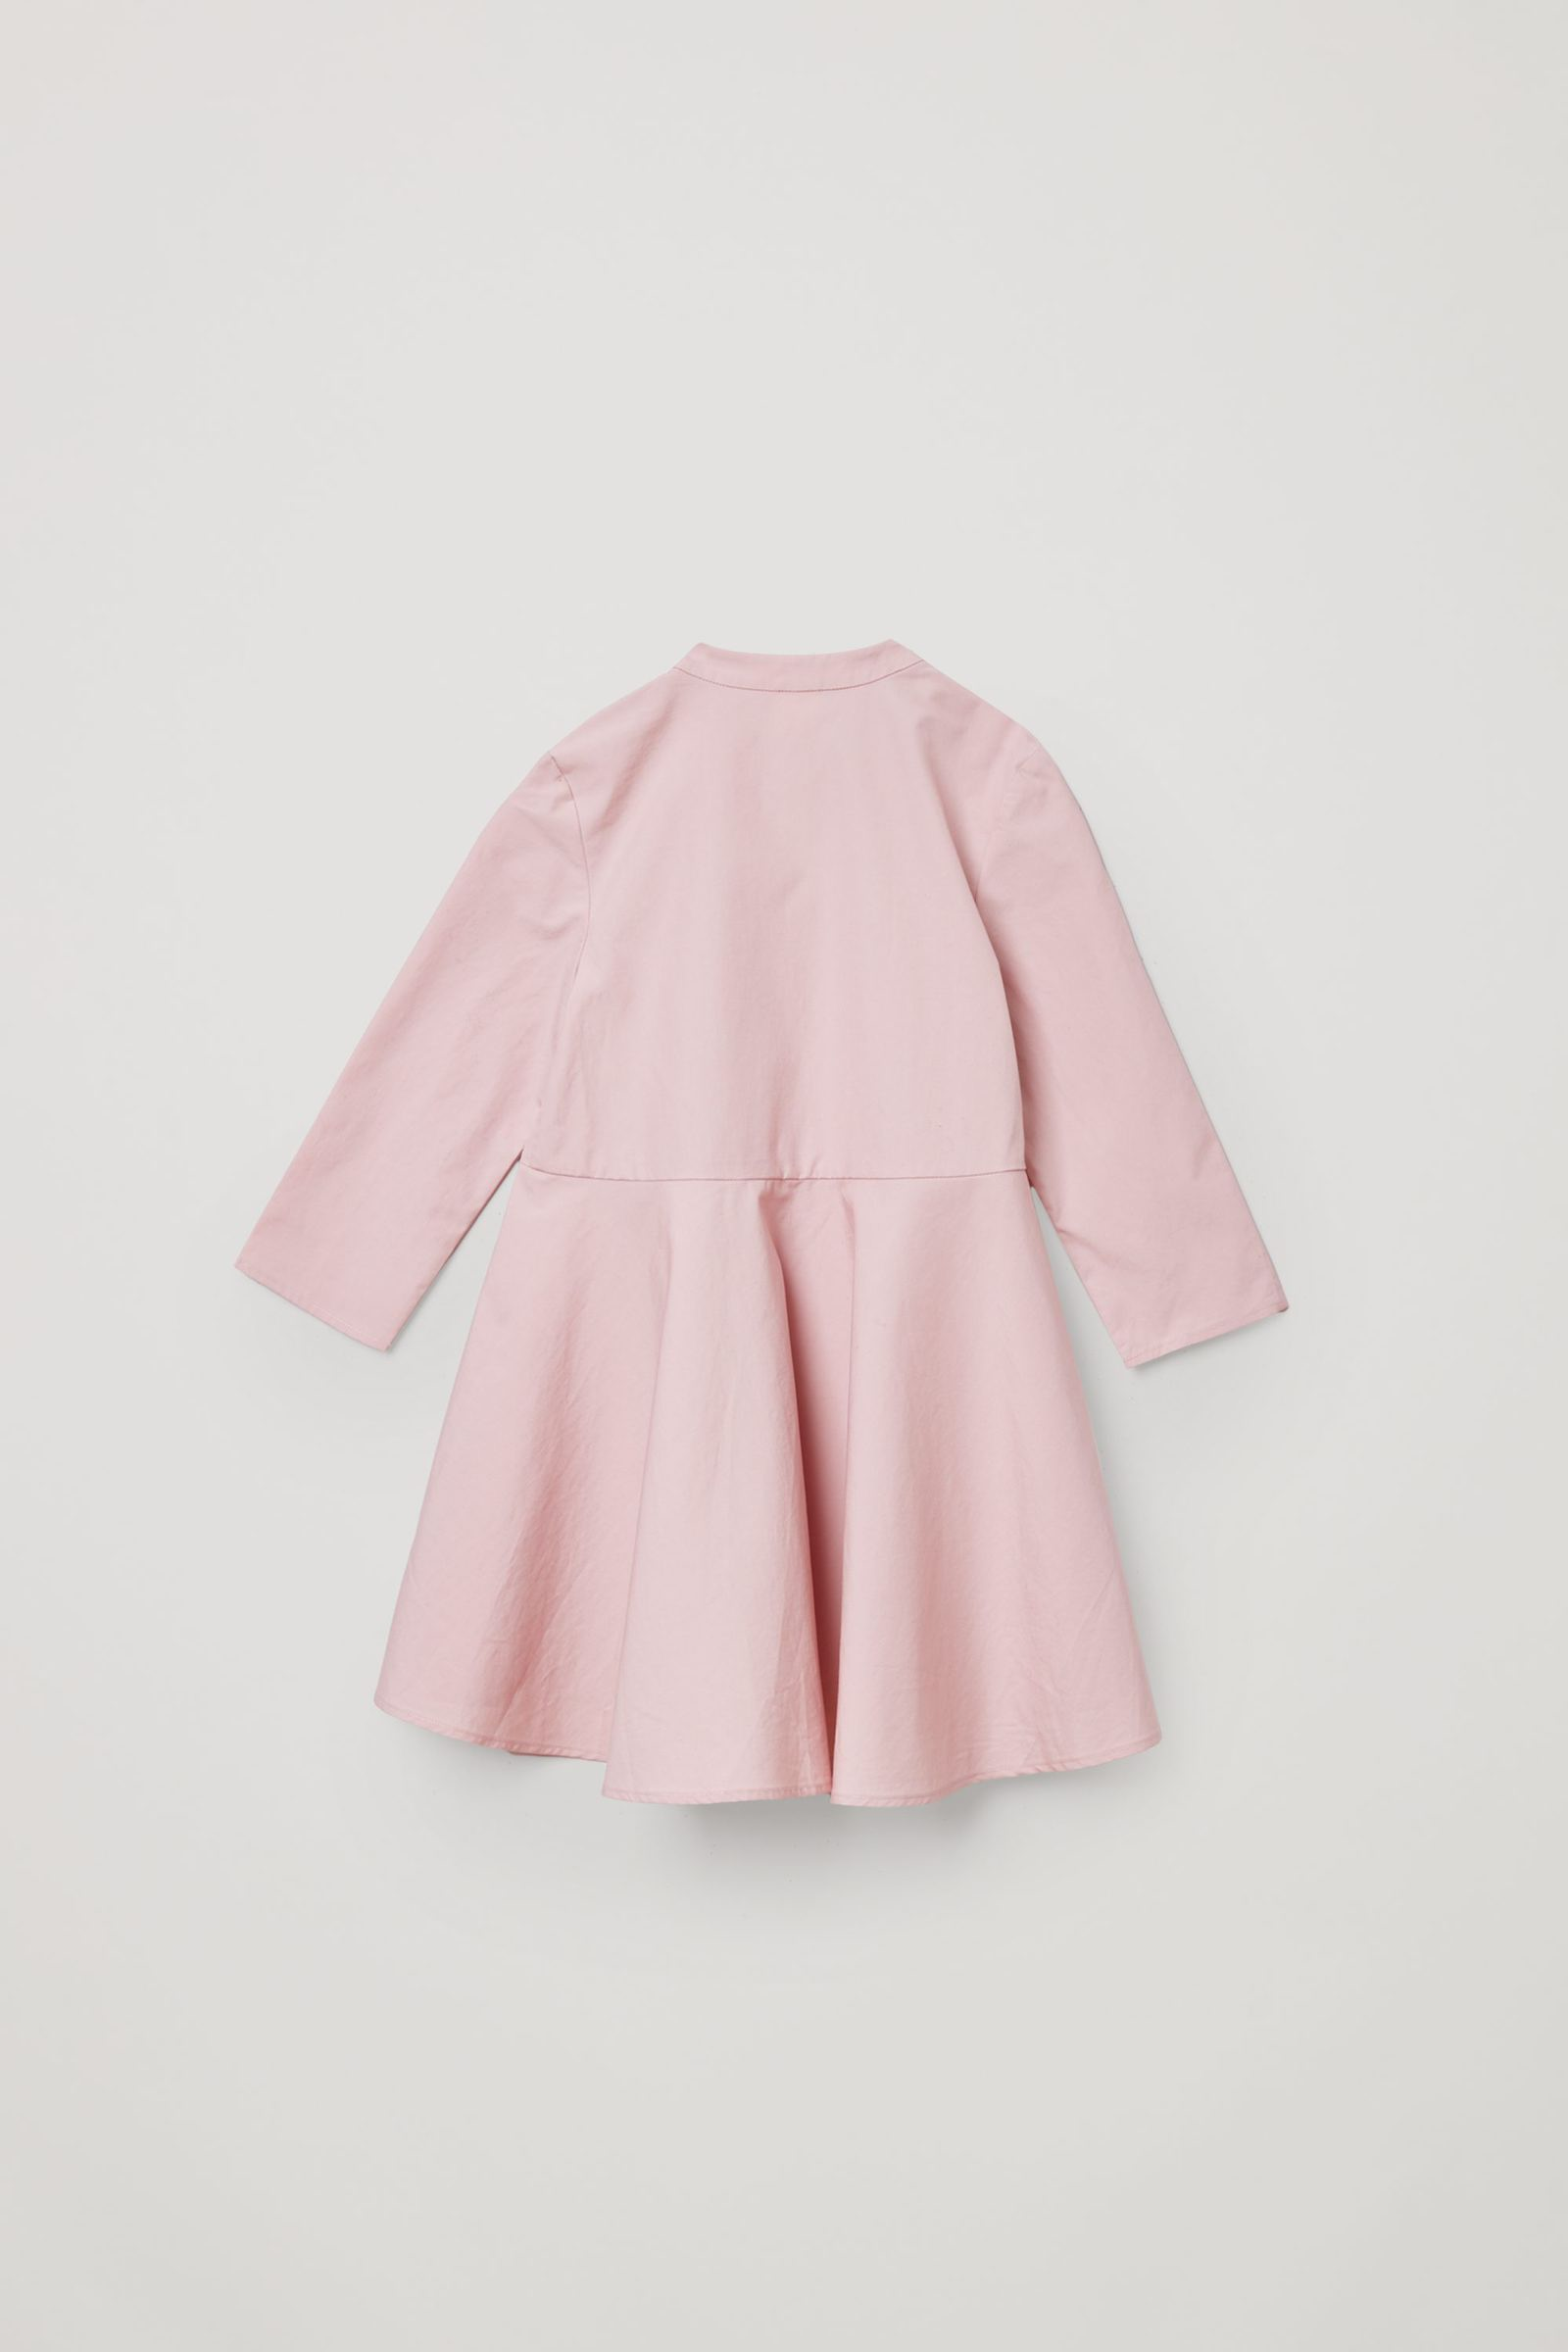 COS 포켓 코튼 드레스의 핑크컬러 Product입니다.